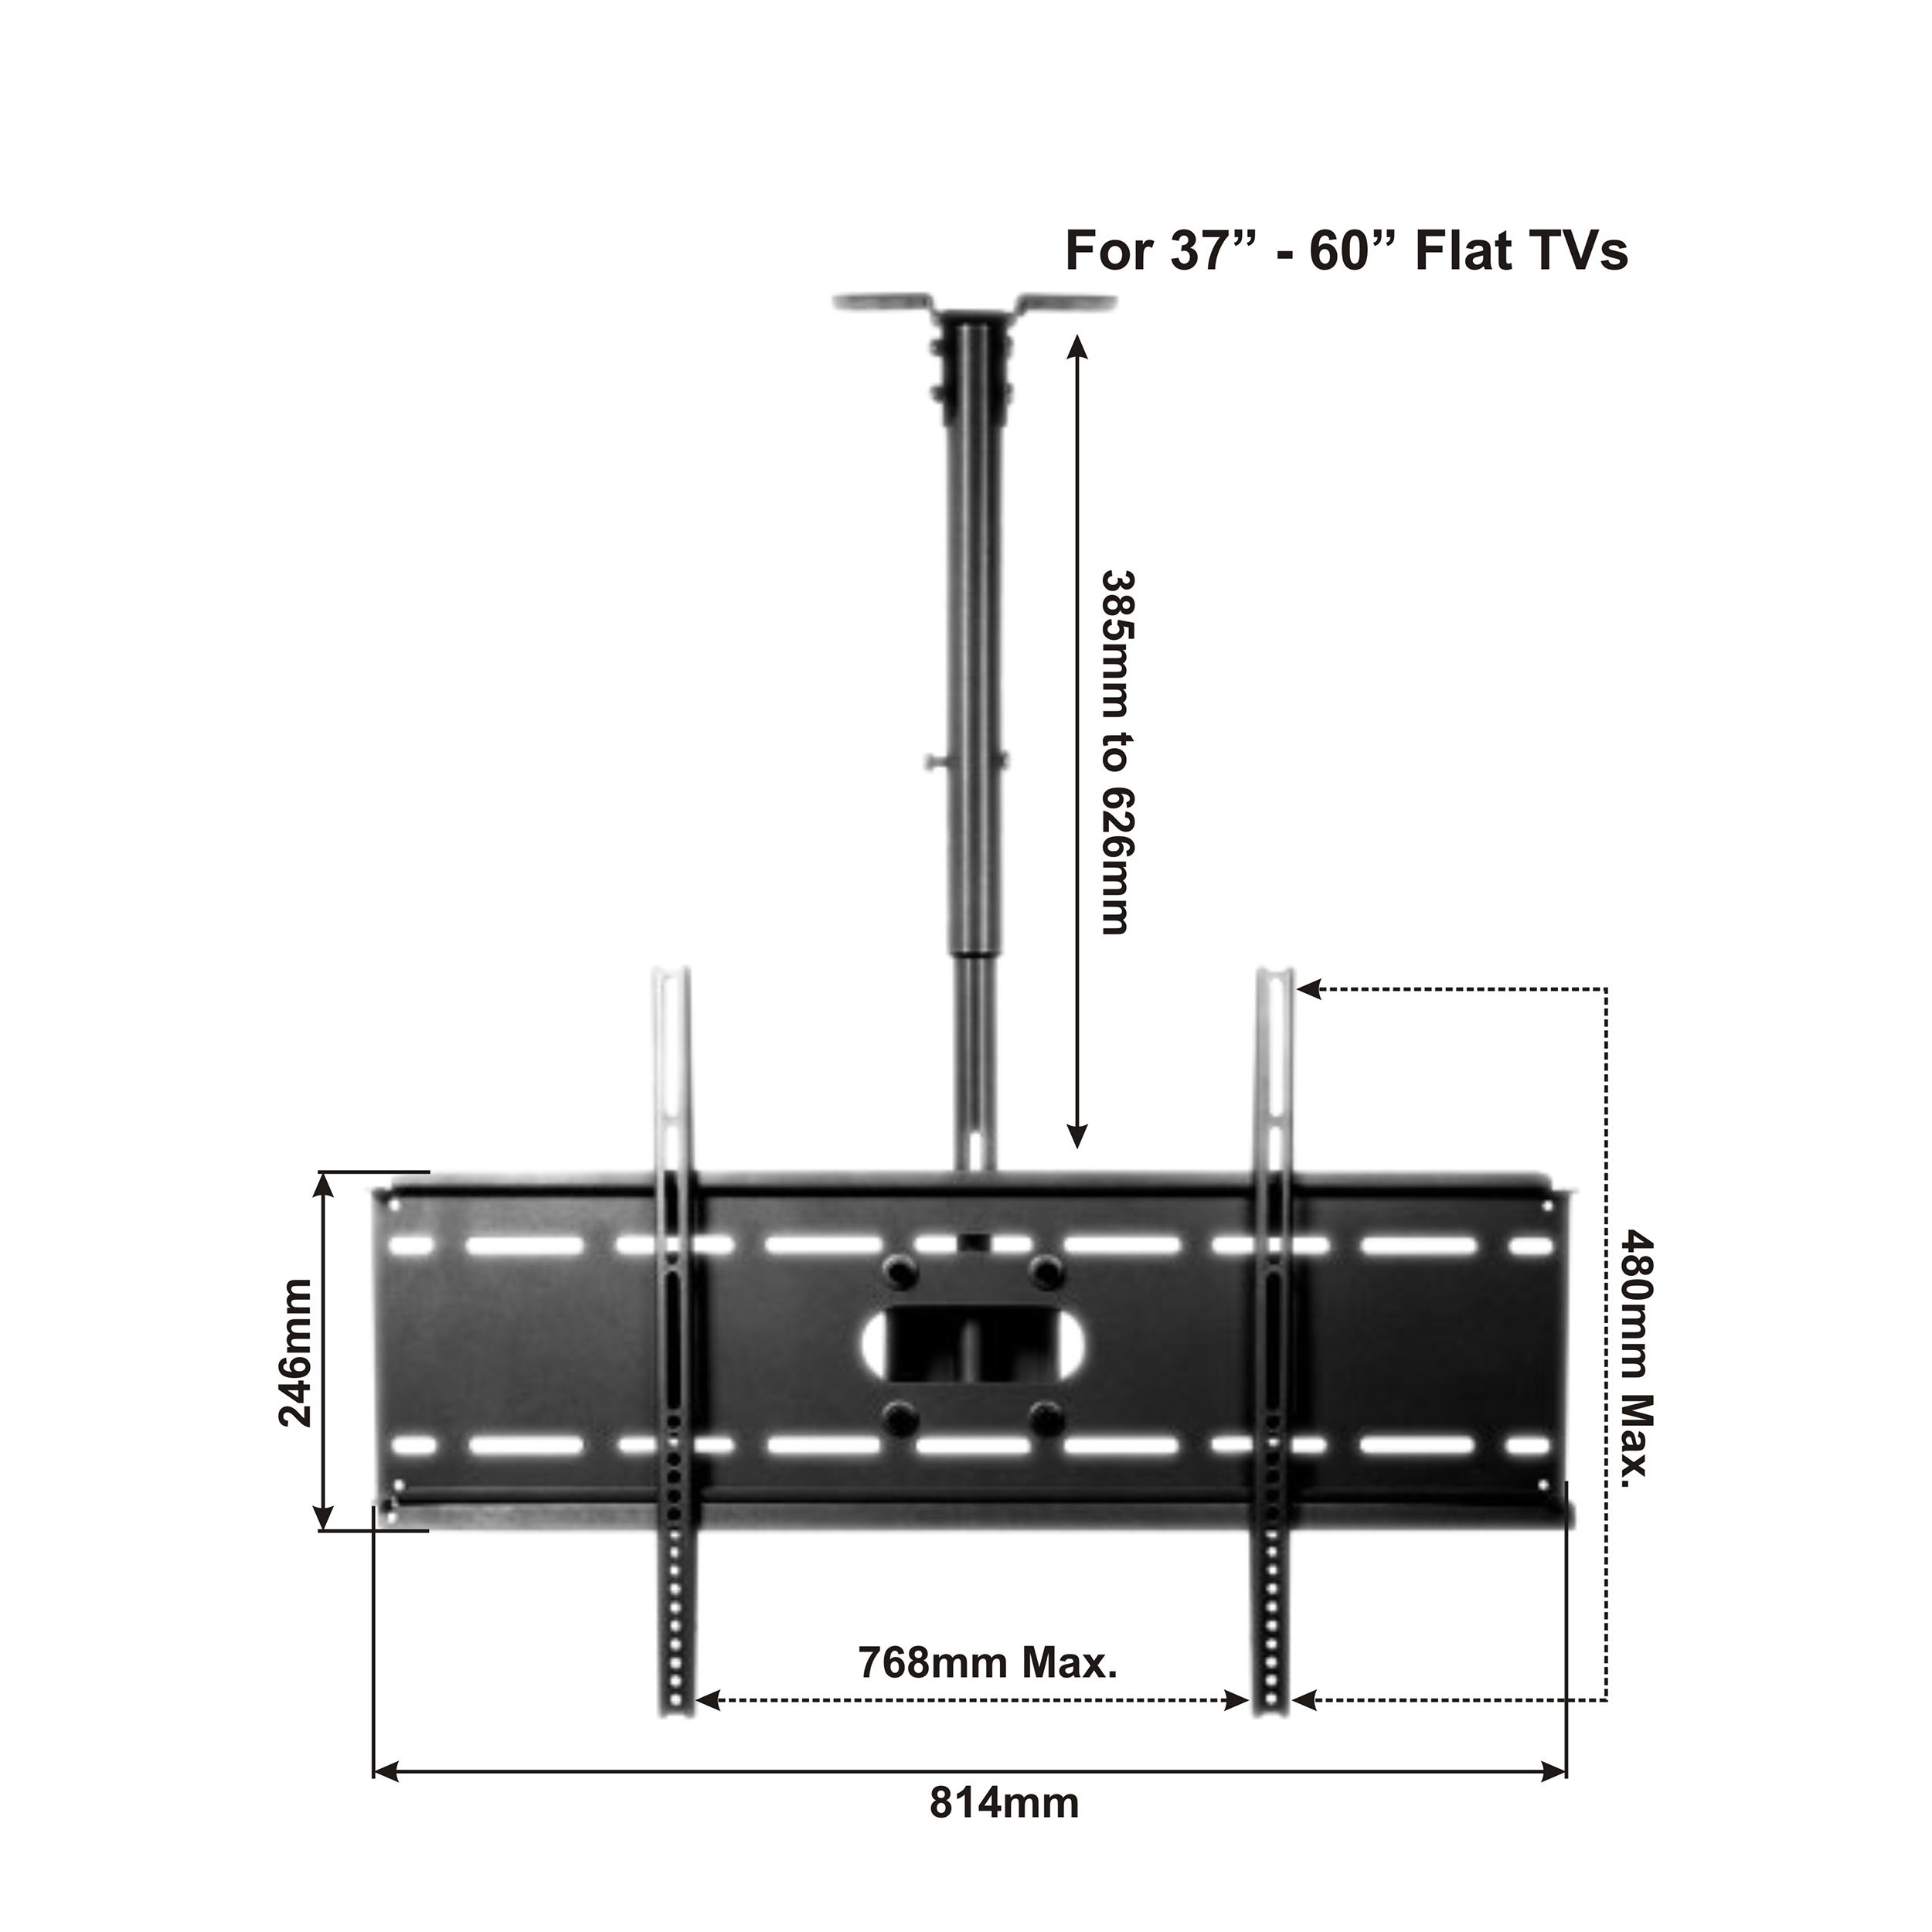 Shop Arrowmounts Tilt Ceiling Mount For 37 60 Flat Panel Tv Am Engineering Schematics Plasma Screen C6010b Free Shipping Today 5127409